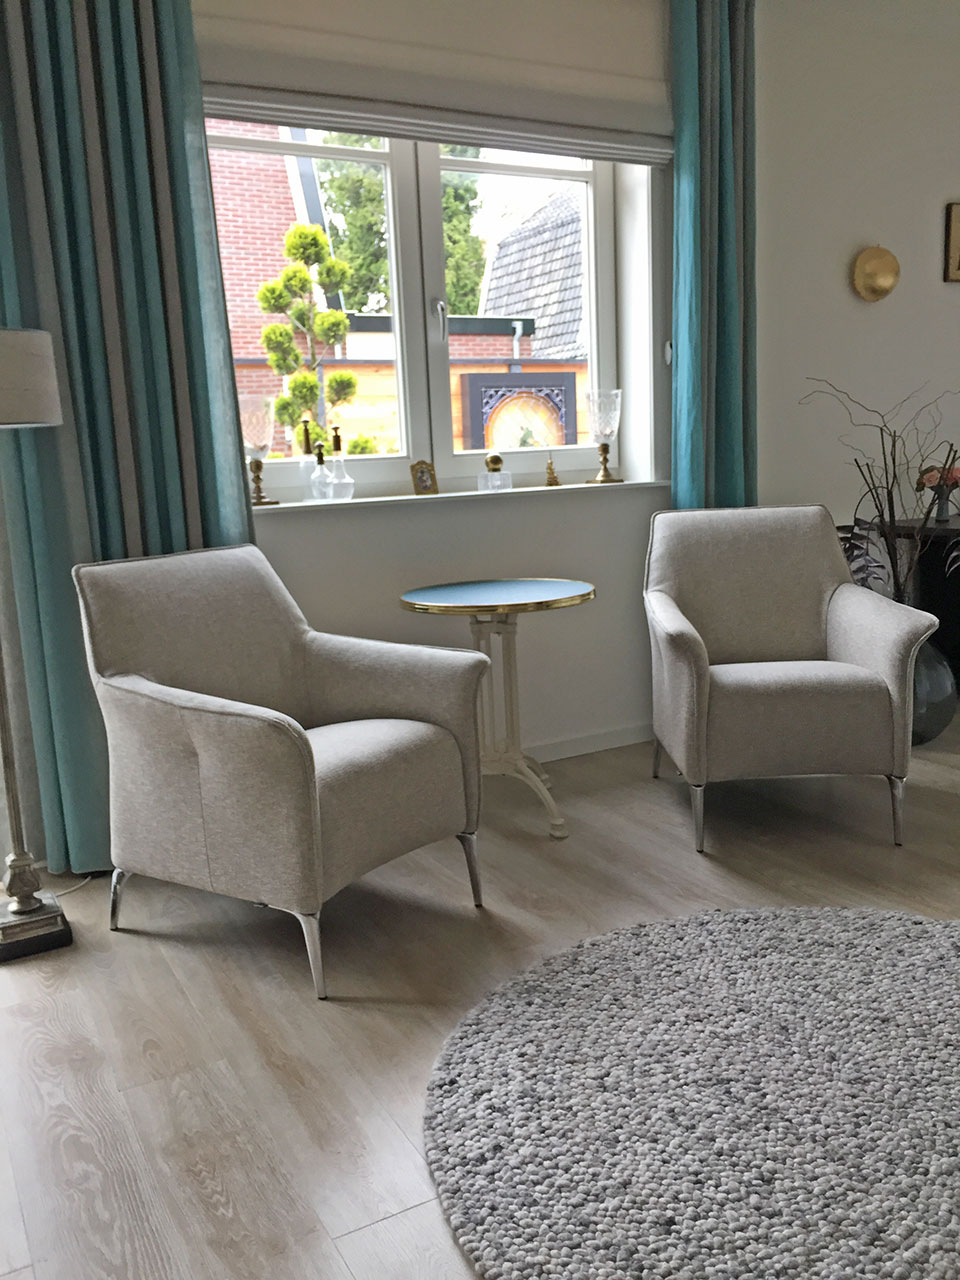 Interieur Baarn Leolux Mayuro fauteuils